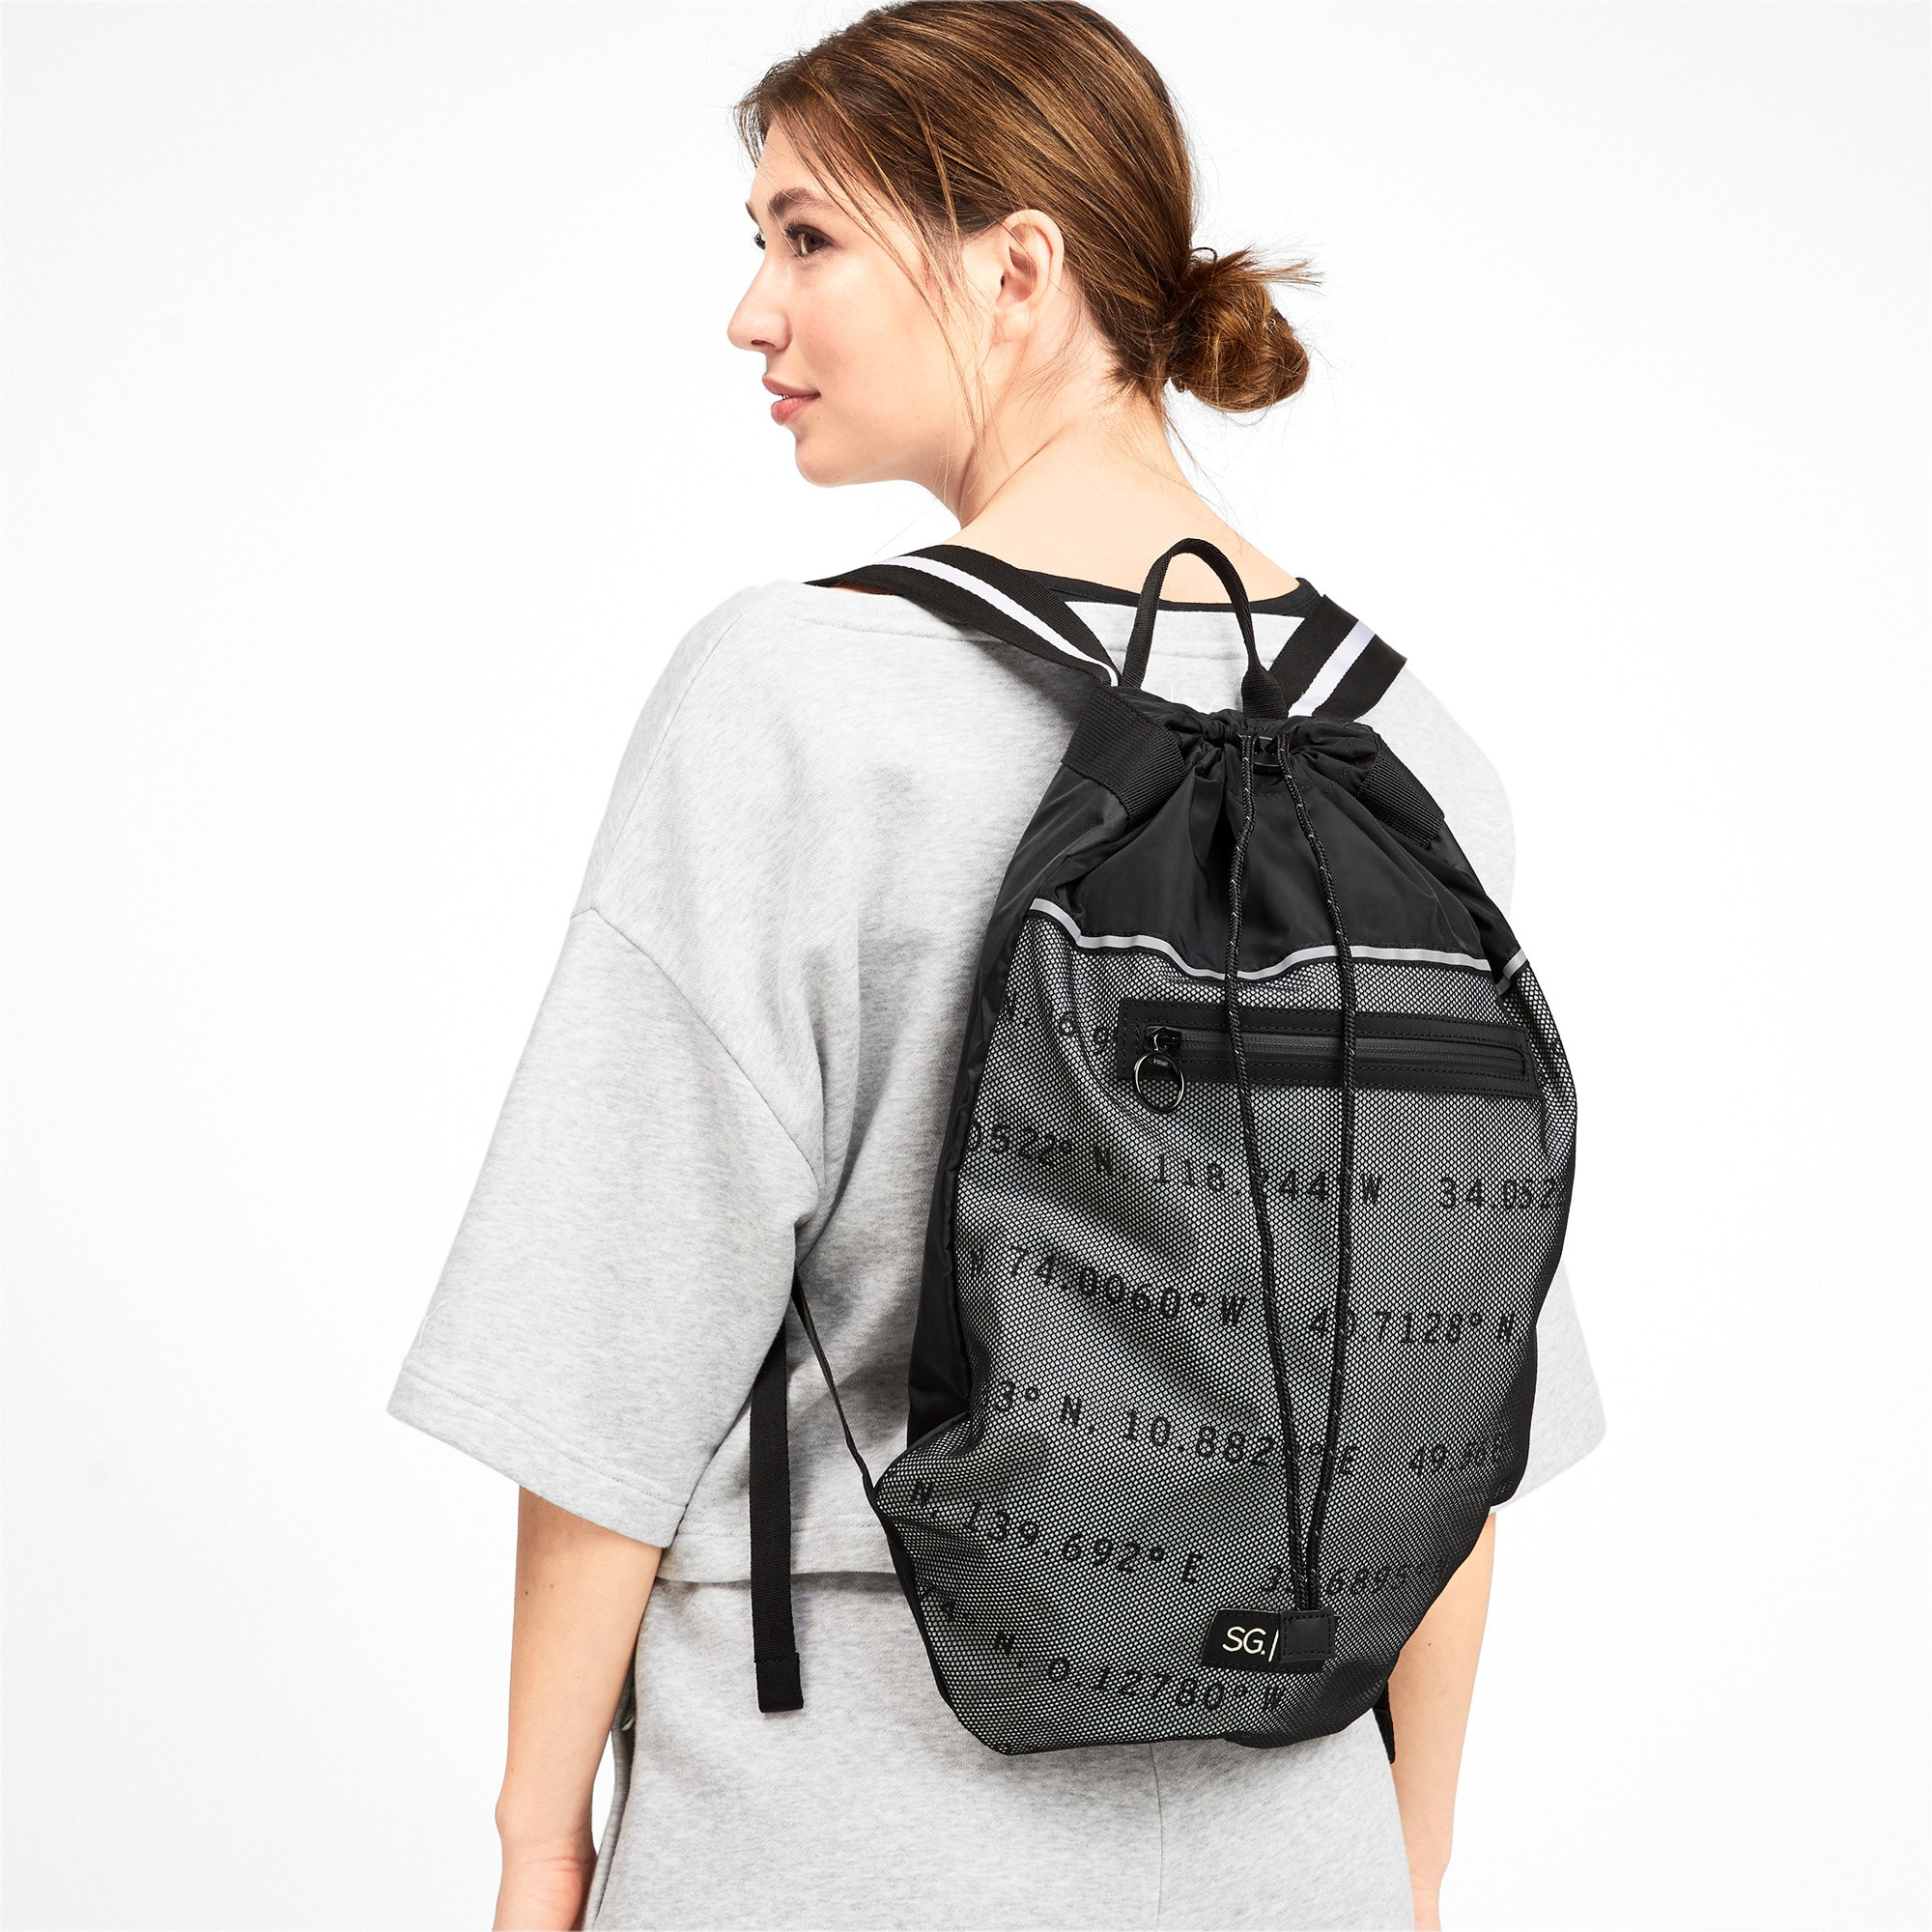 Thumbnail 2 of SG x PUMA Sport Smart Bag, Puma Black, medium